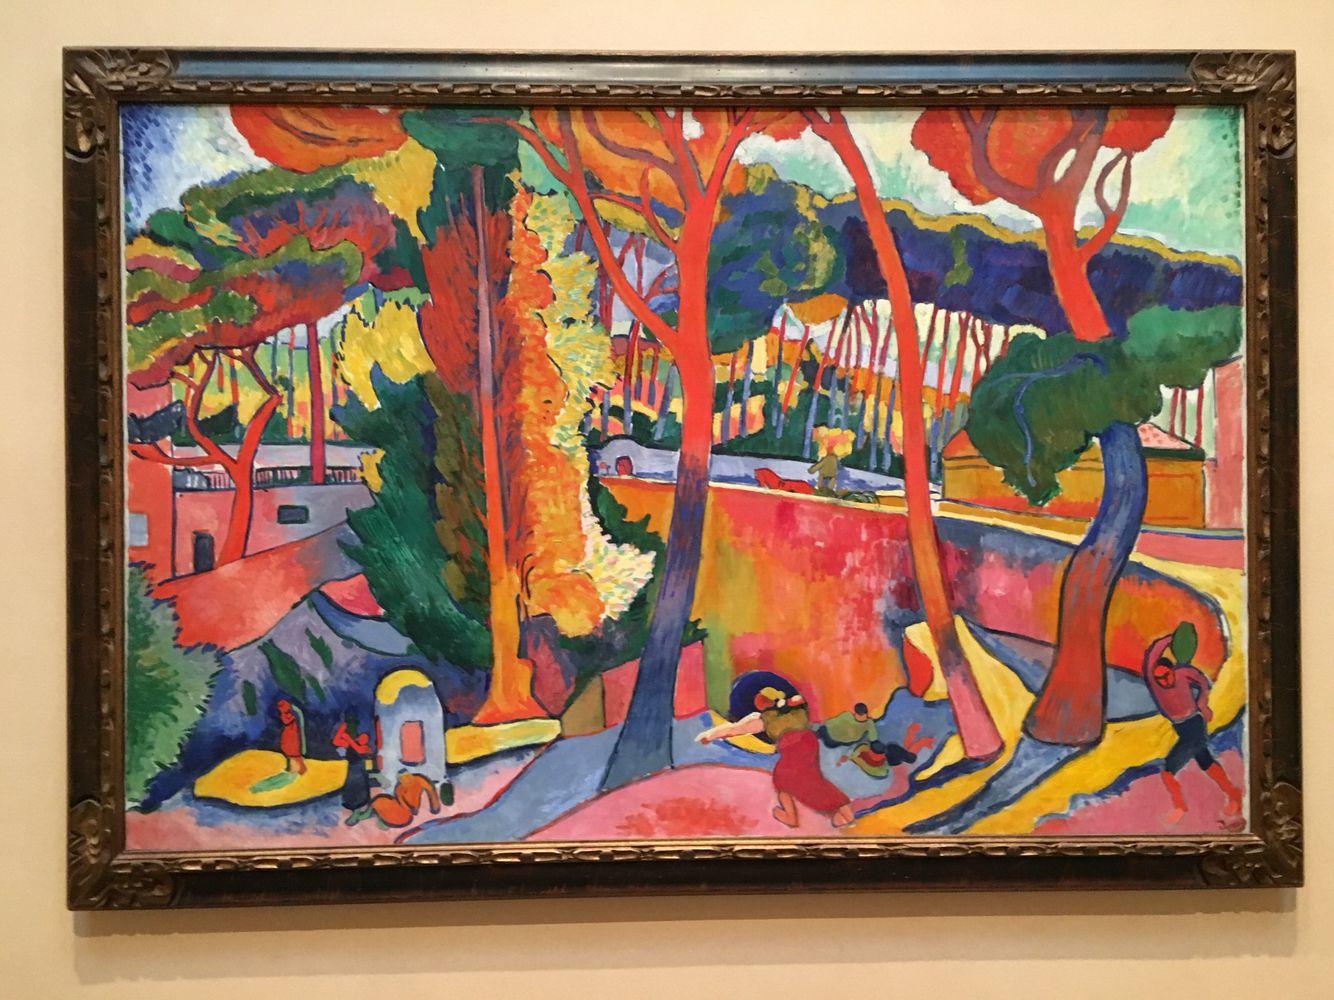 Watercolor art galleries in houston - Mfah